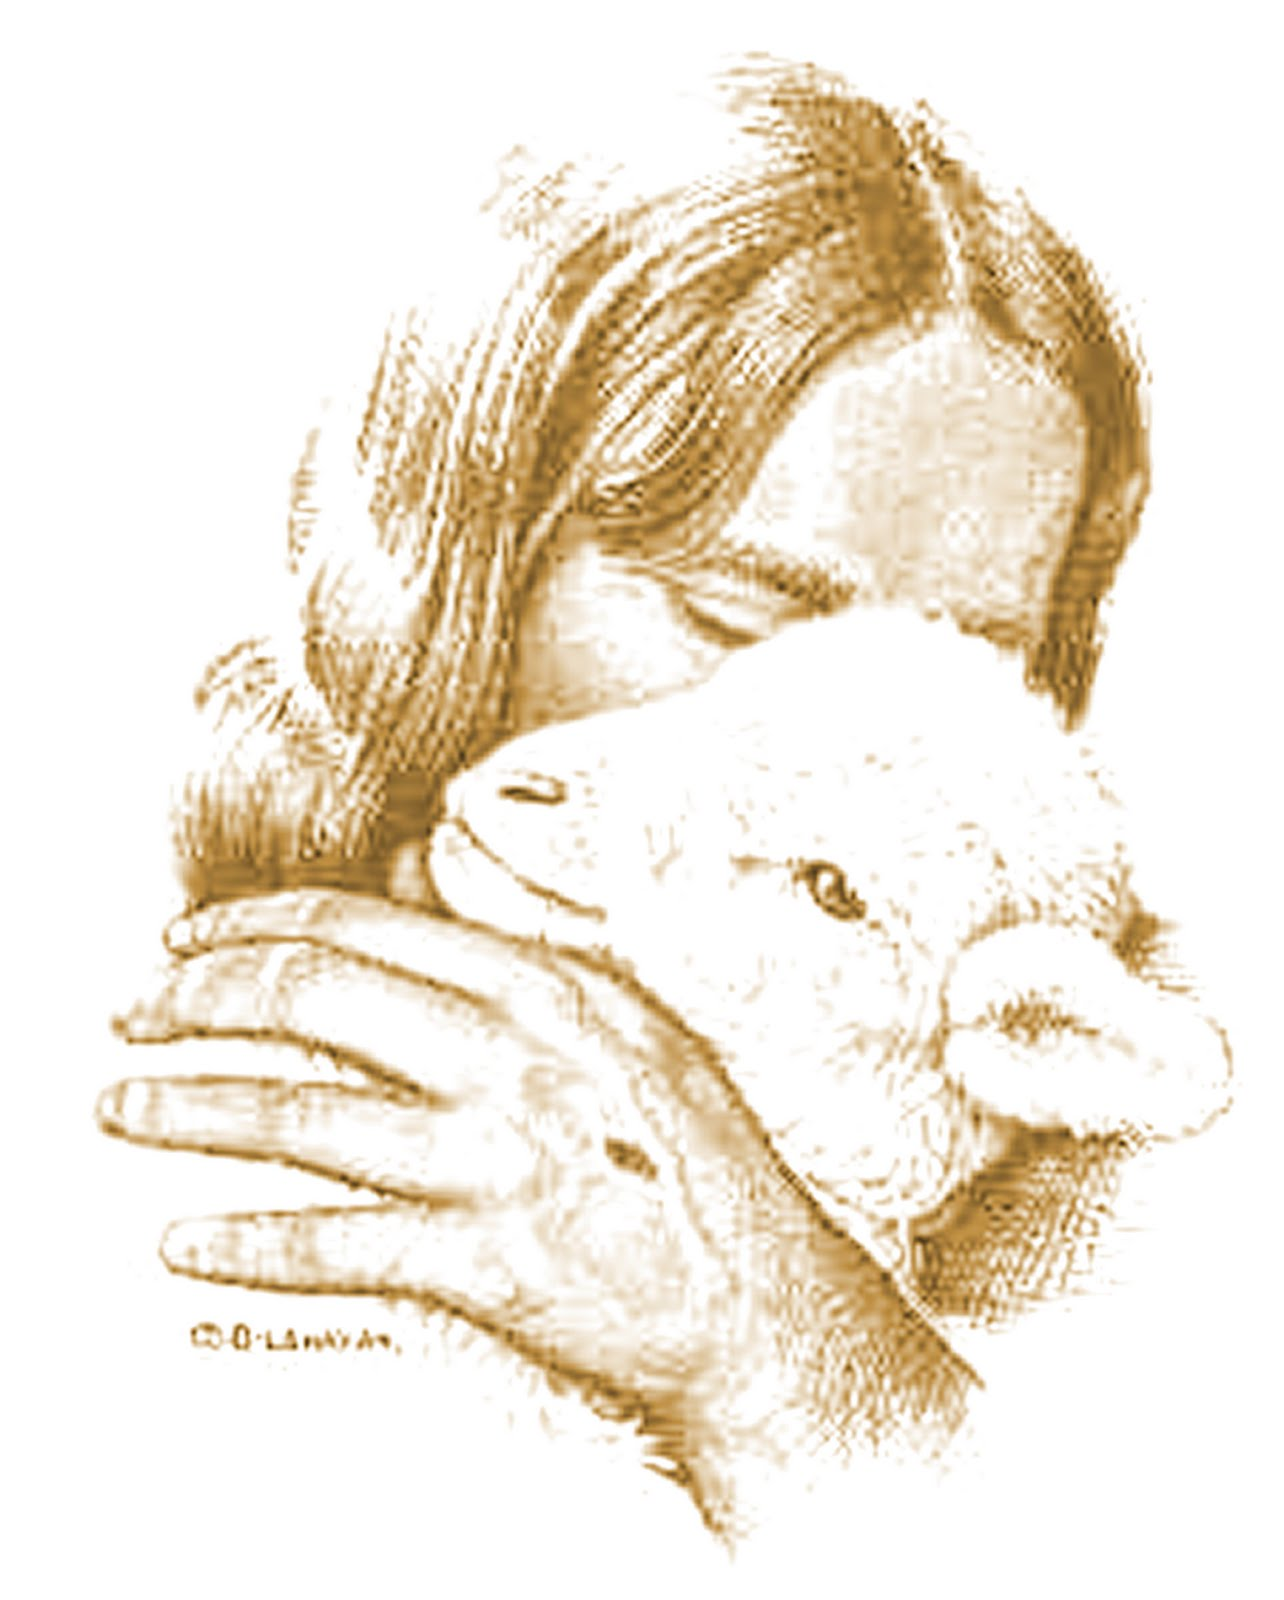 Jesus Shepherd and His Sheep